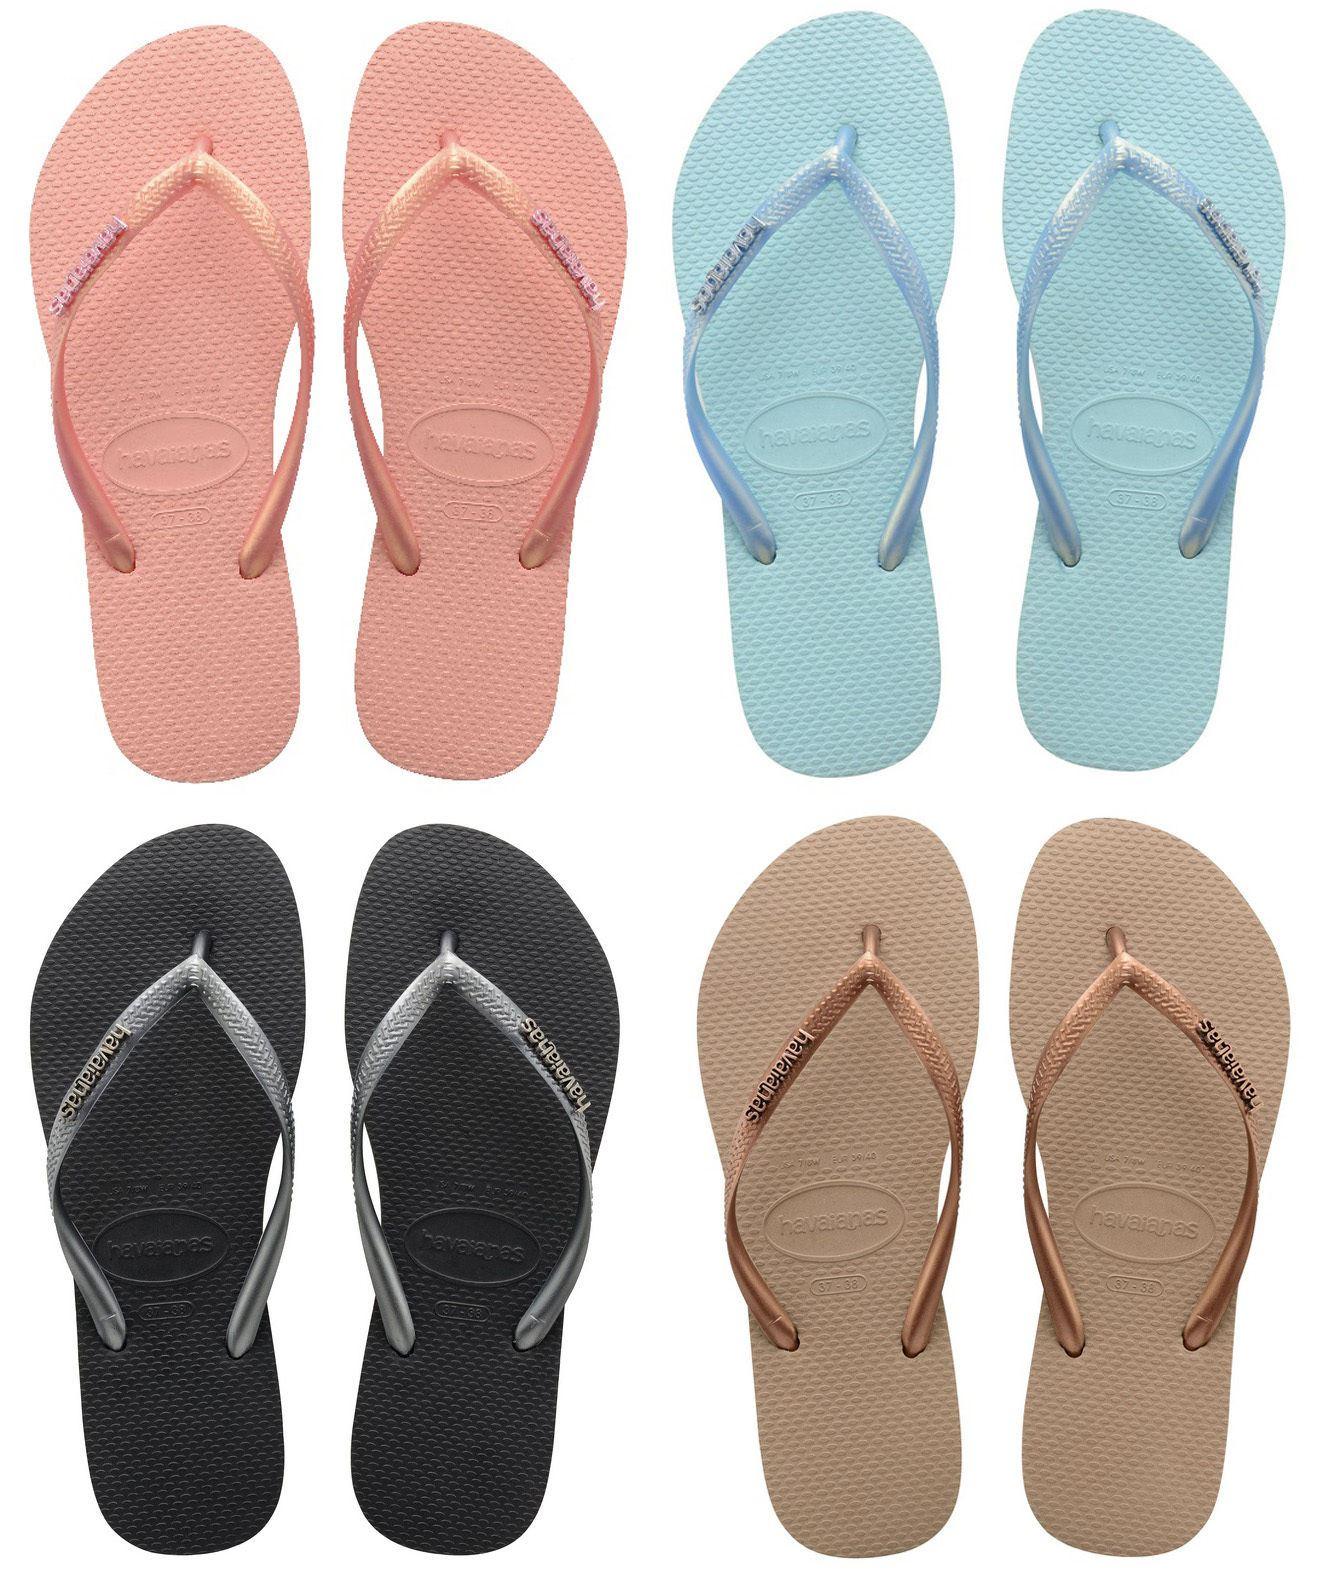 785e48aecffa Havaianas Brazil Women Flip Flops Vary Colors Slim Metallic Logo Sandal All  Size